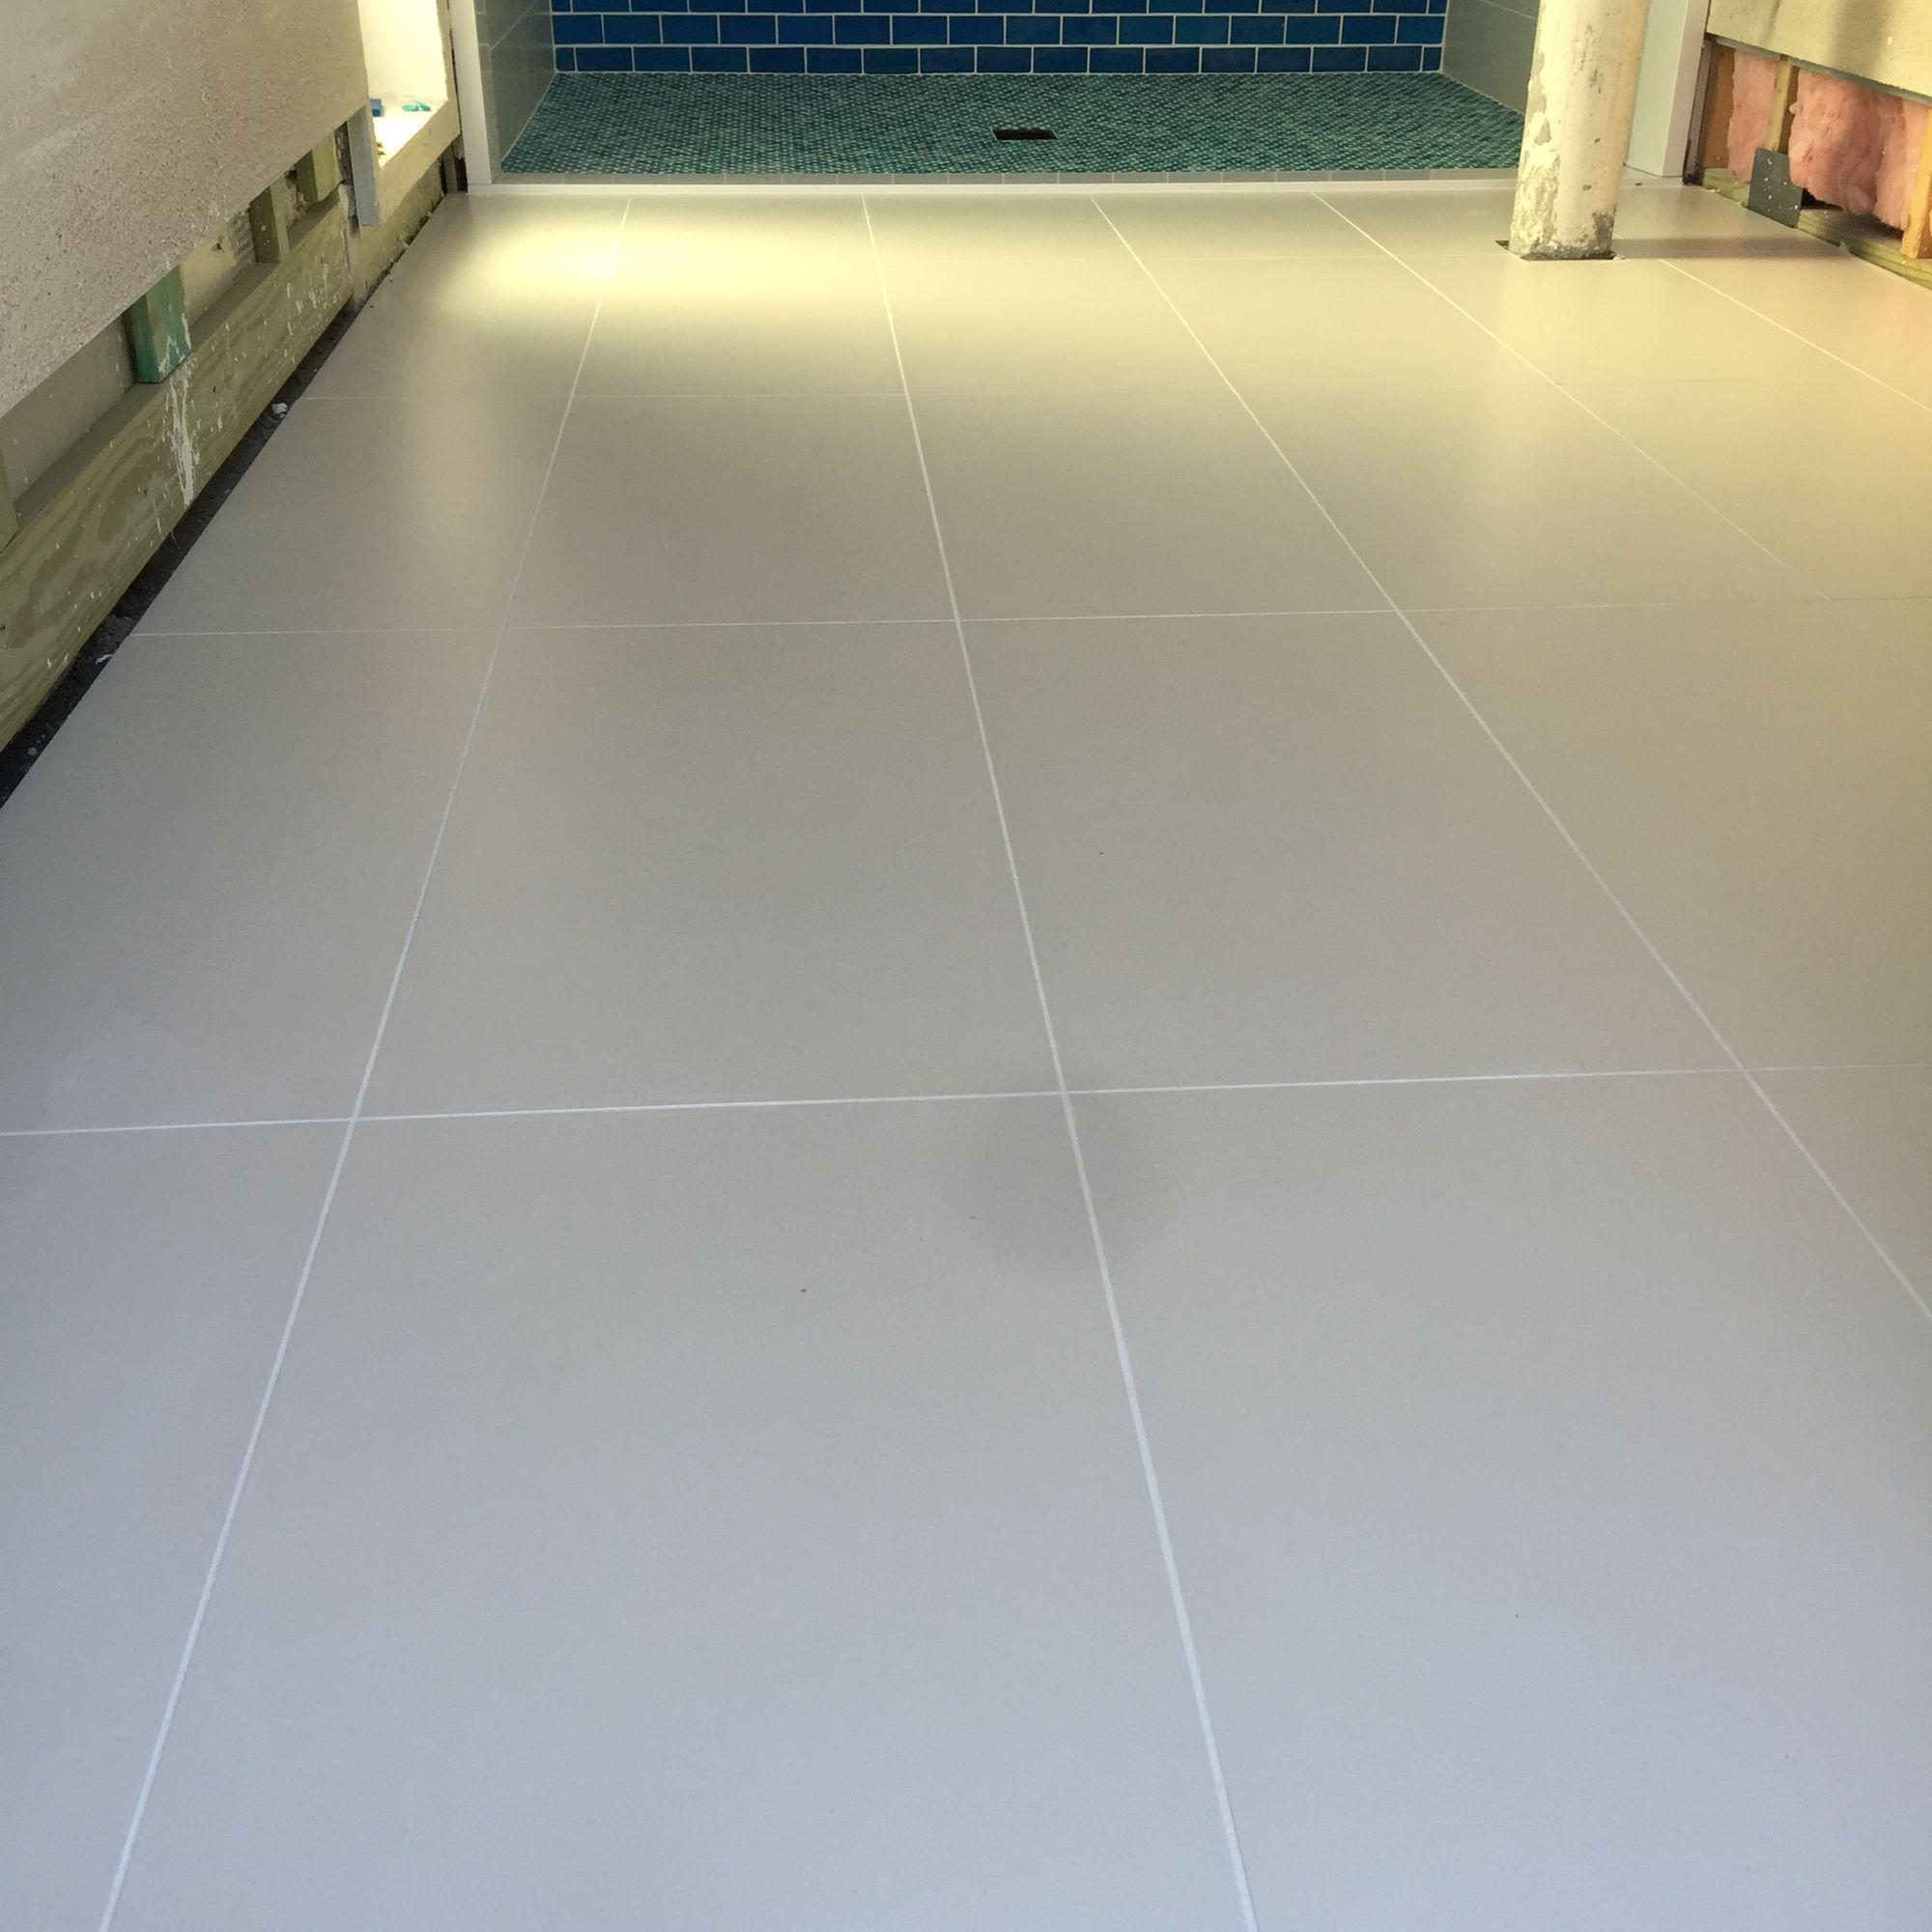 12x24 rectified porcelain tile